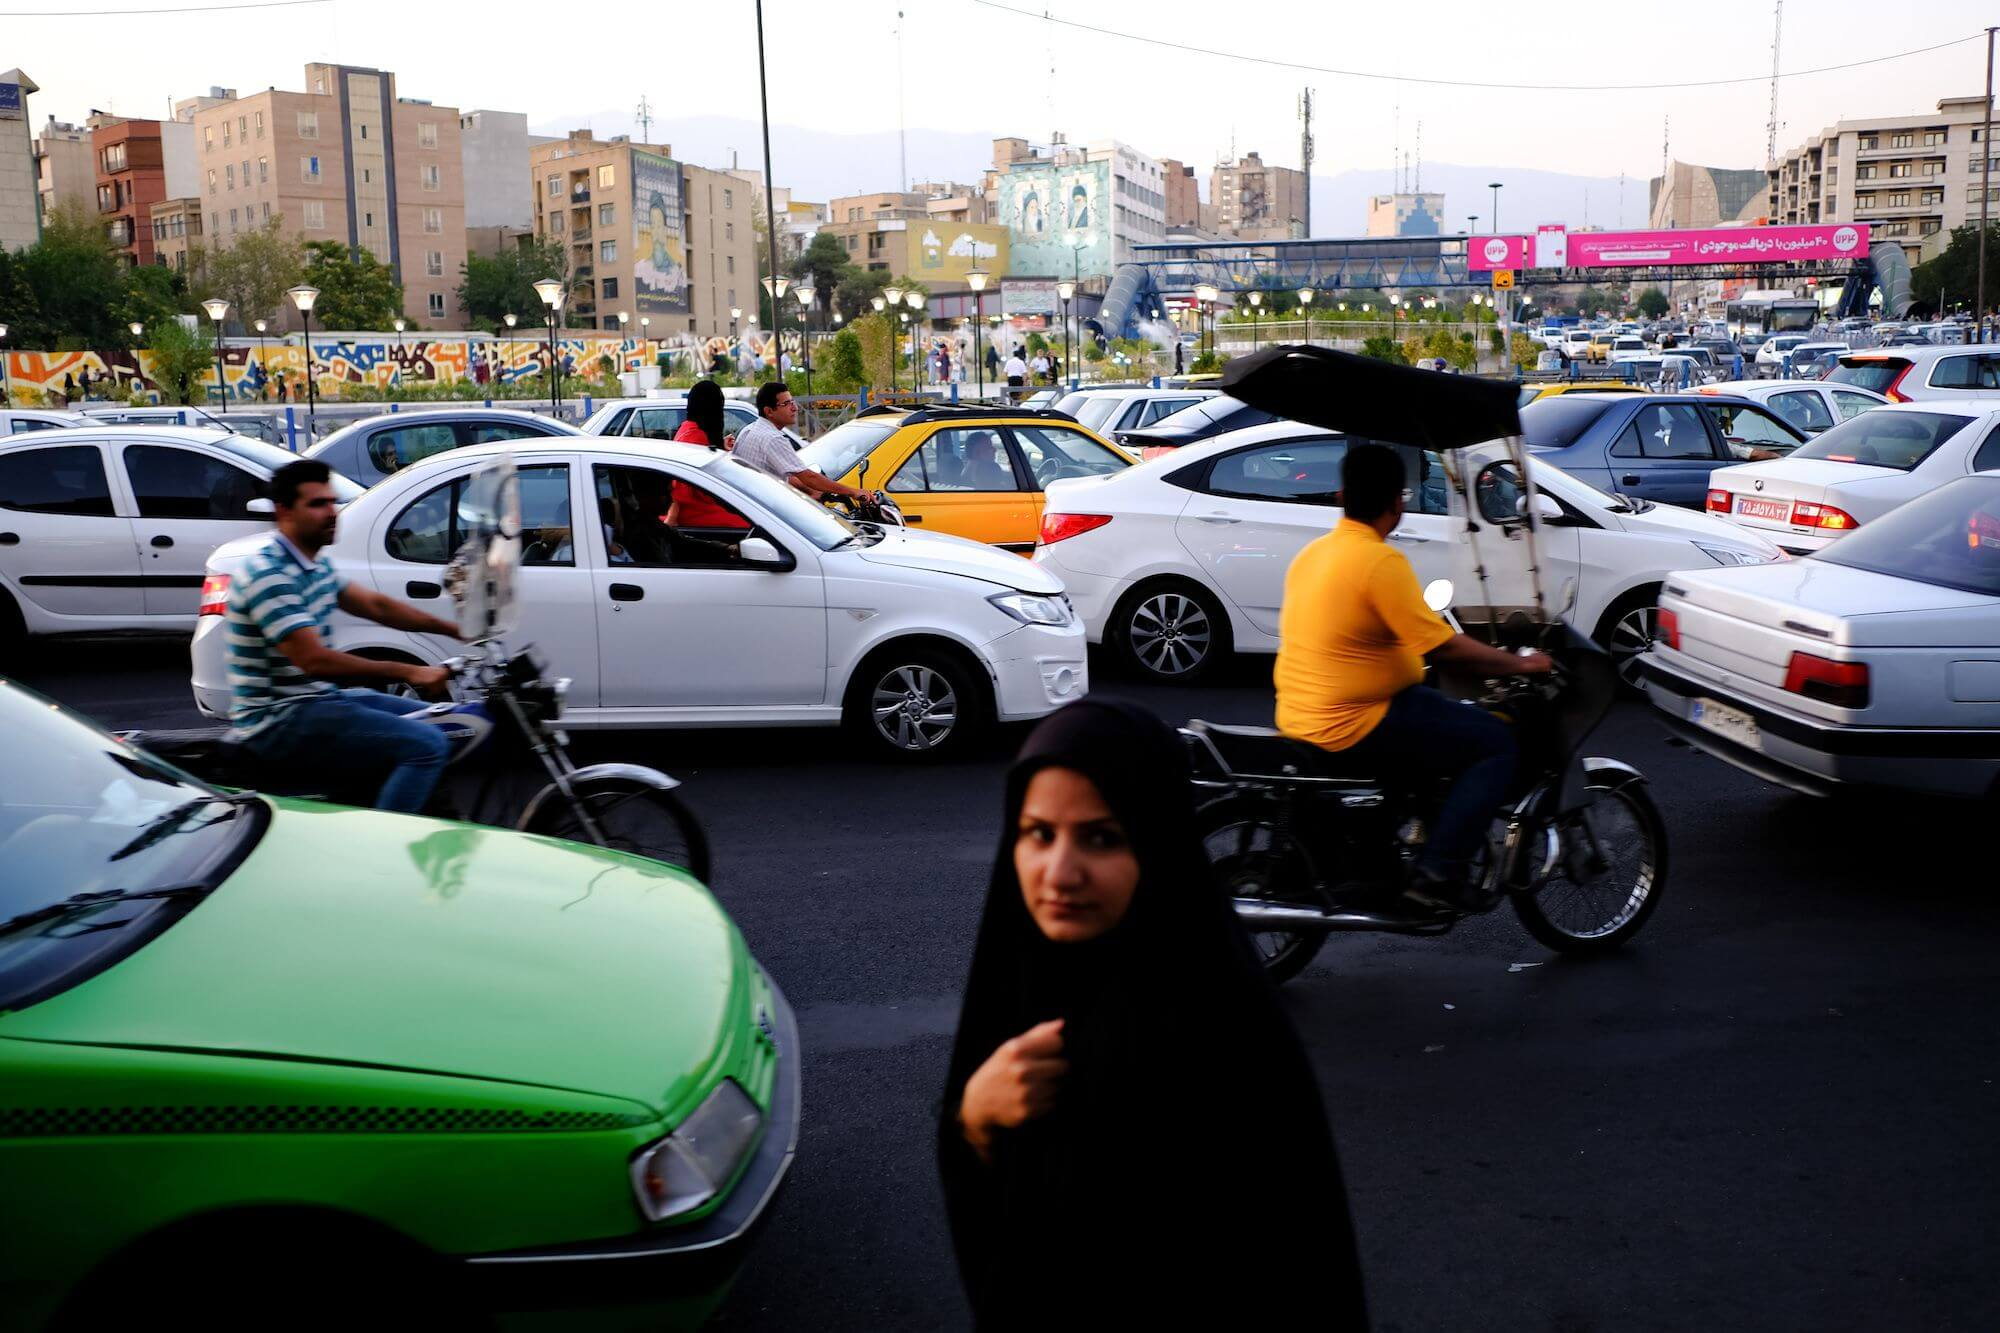 Teheran centro Piazza Aft e tir compressor 3 giorni a Teheran